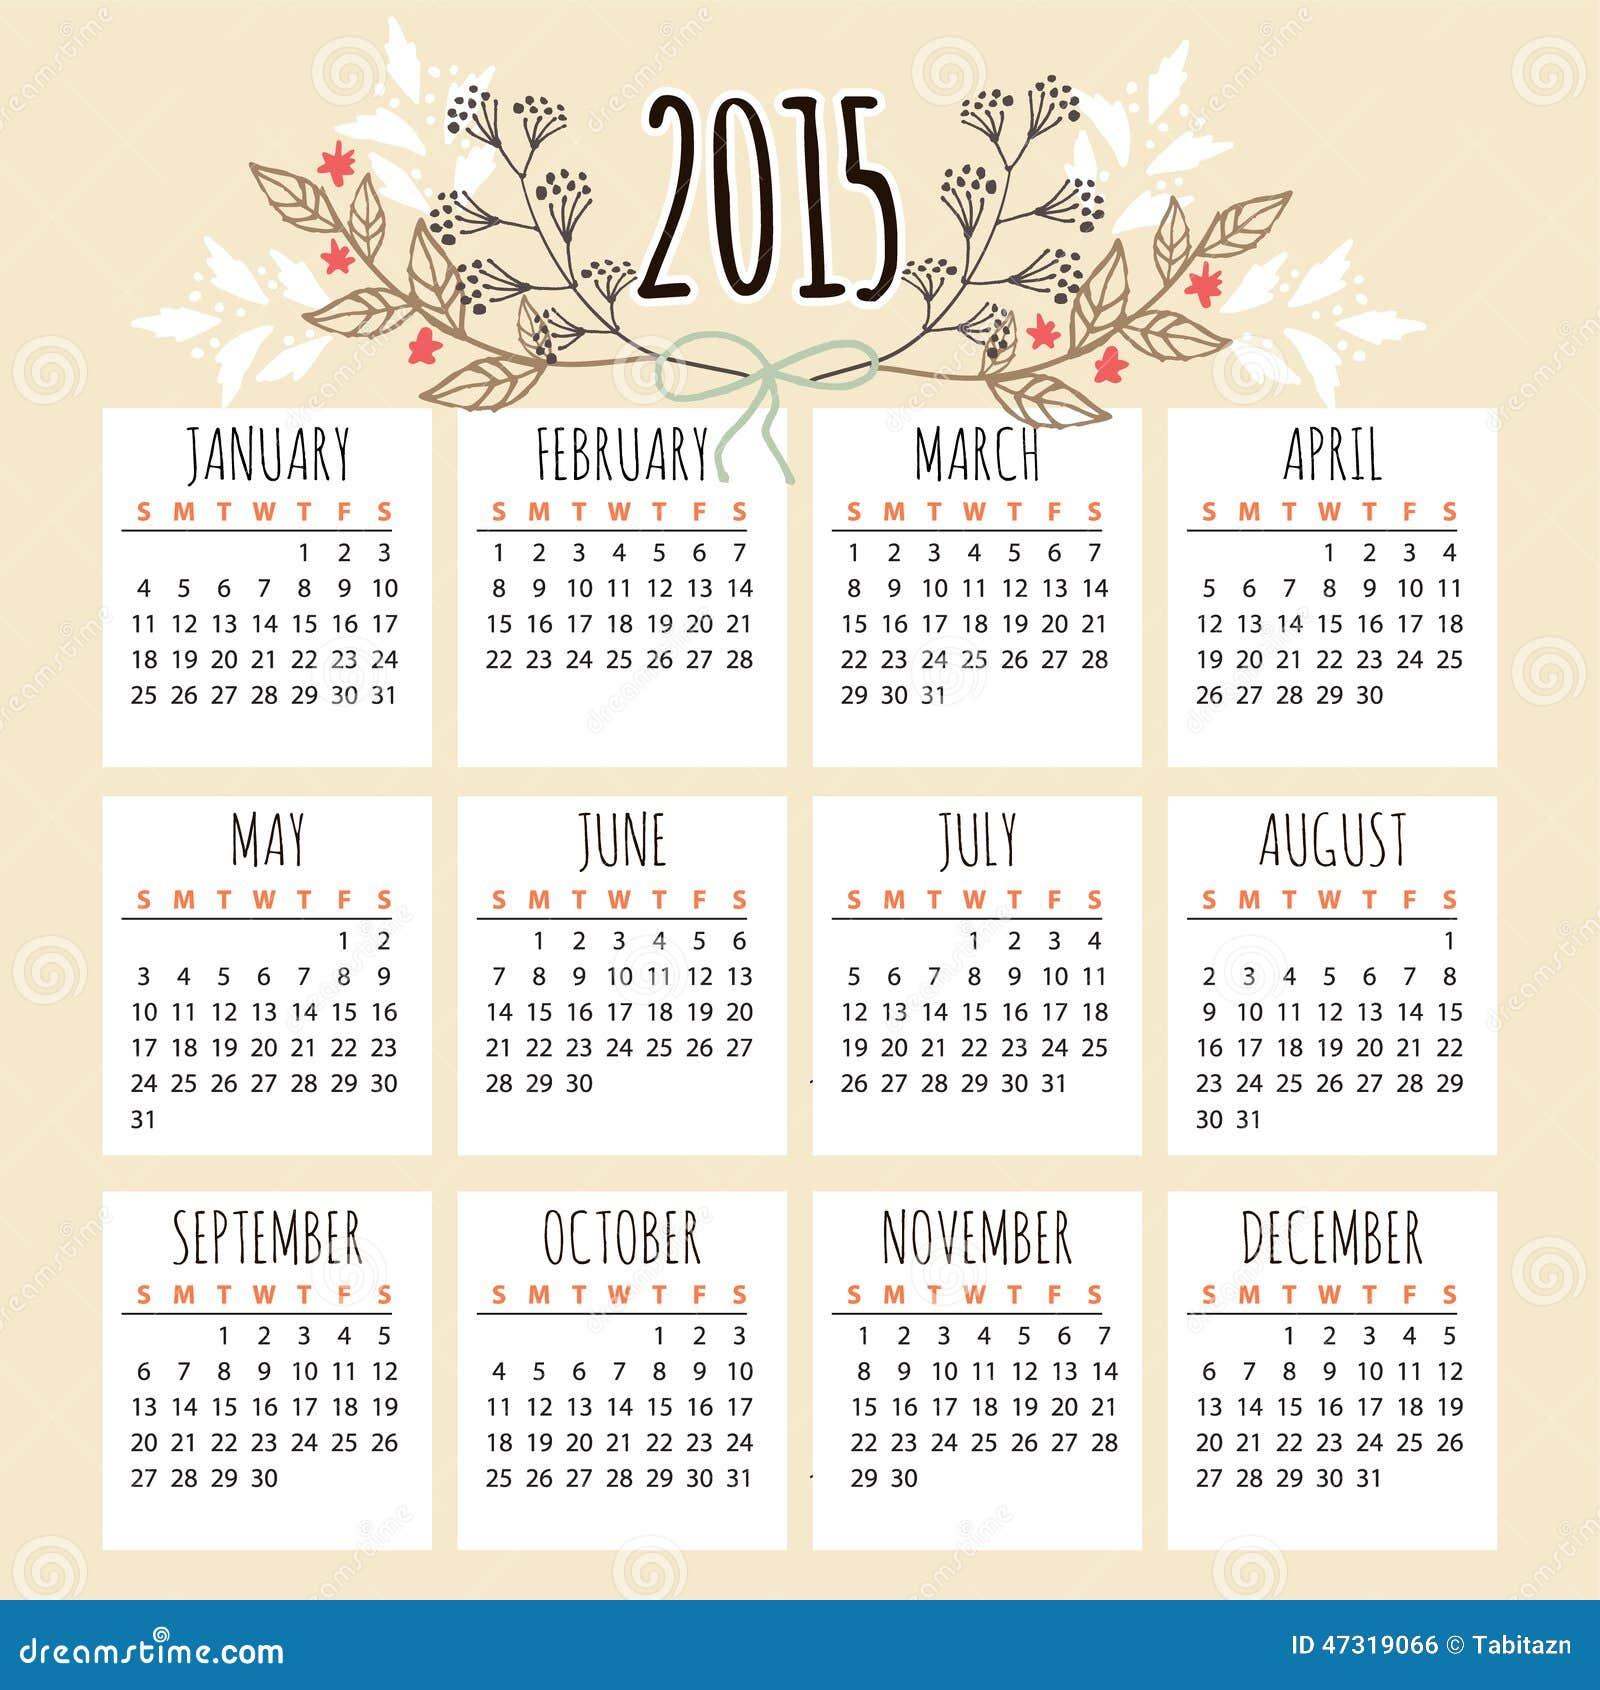 Cute Calendar Illustration : Cute calendar with floral elements stock vector